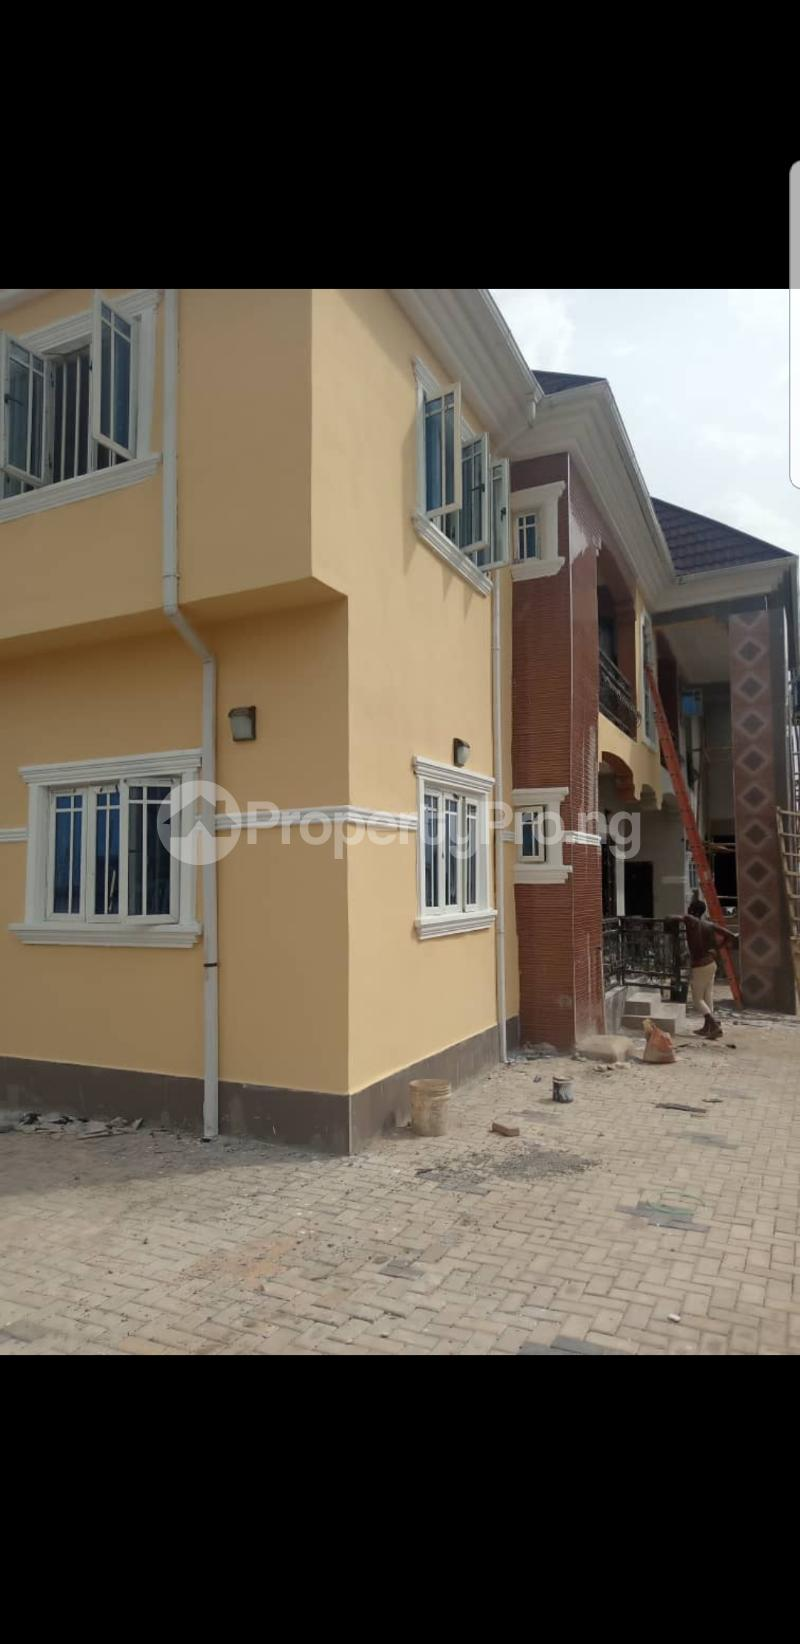 3 bedroom Shared Apartment Flat / Apartment for rent Enugu Enugu - 3